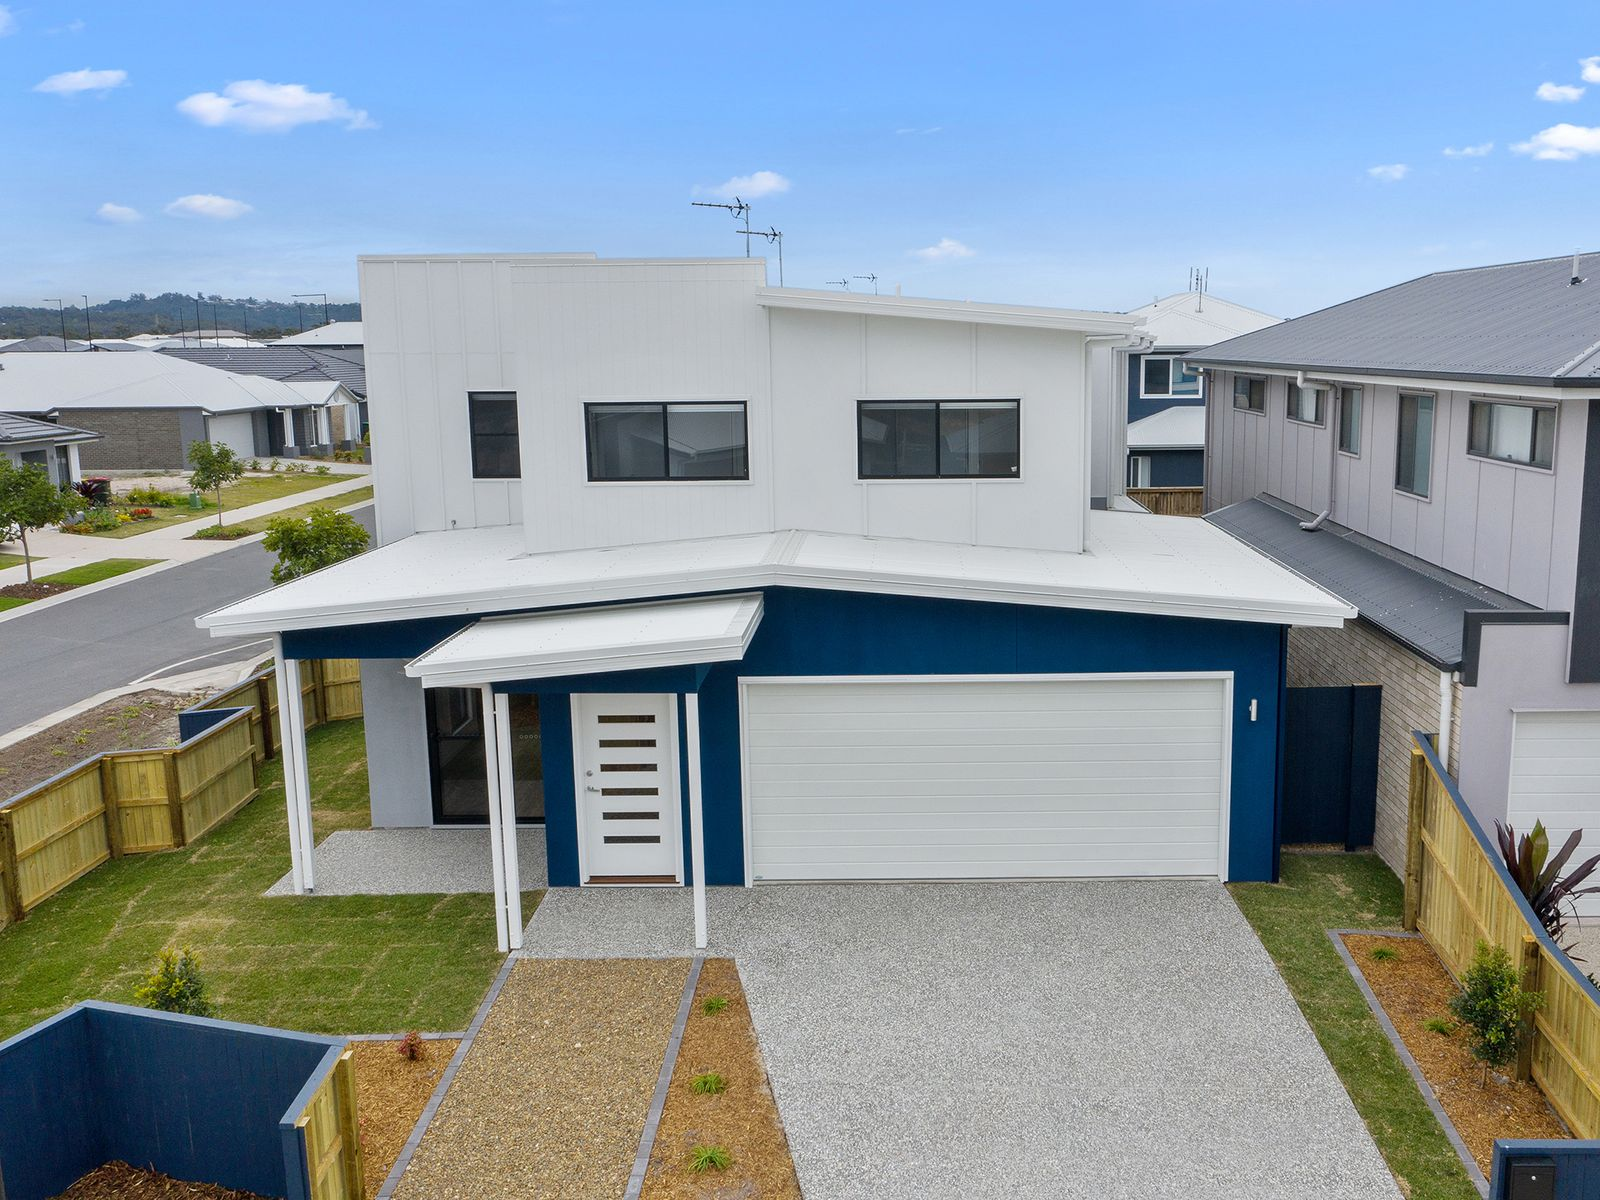 1/20 Walling Street, Palmview, QLD 4553